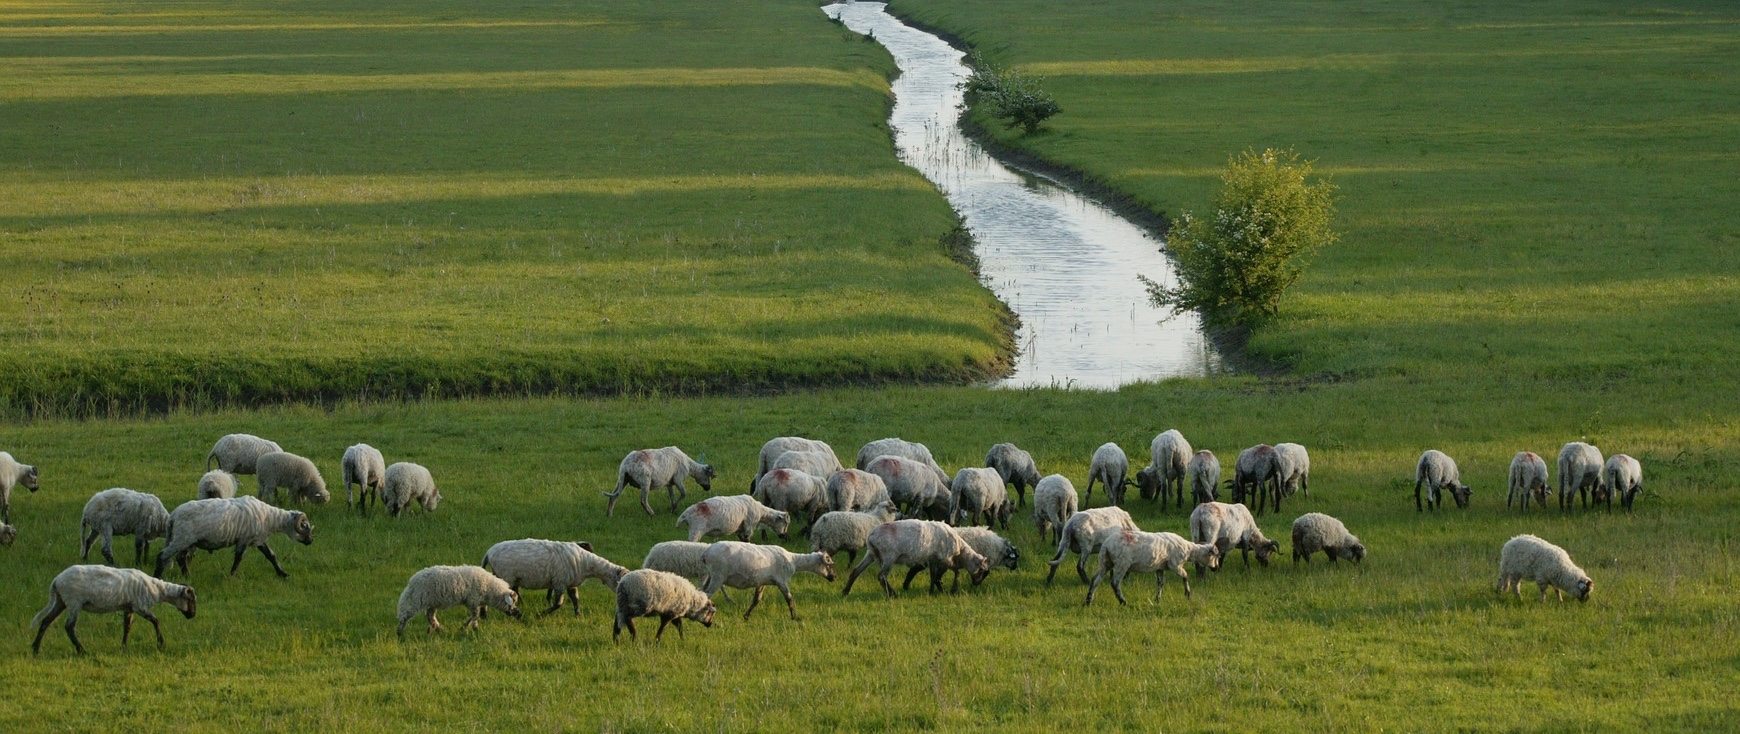 New Shepherds Orientation and Seasoned Shepherds Revitalization